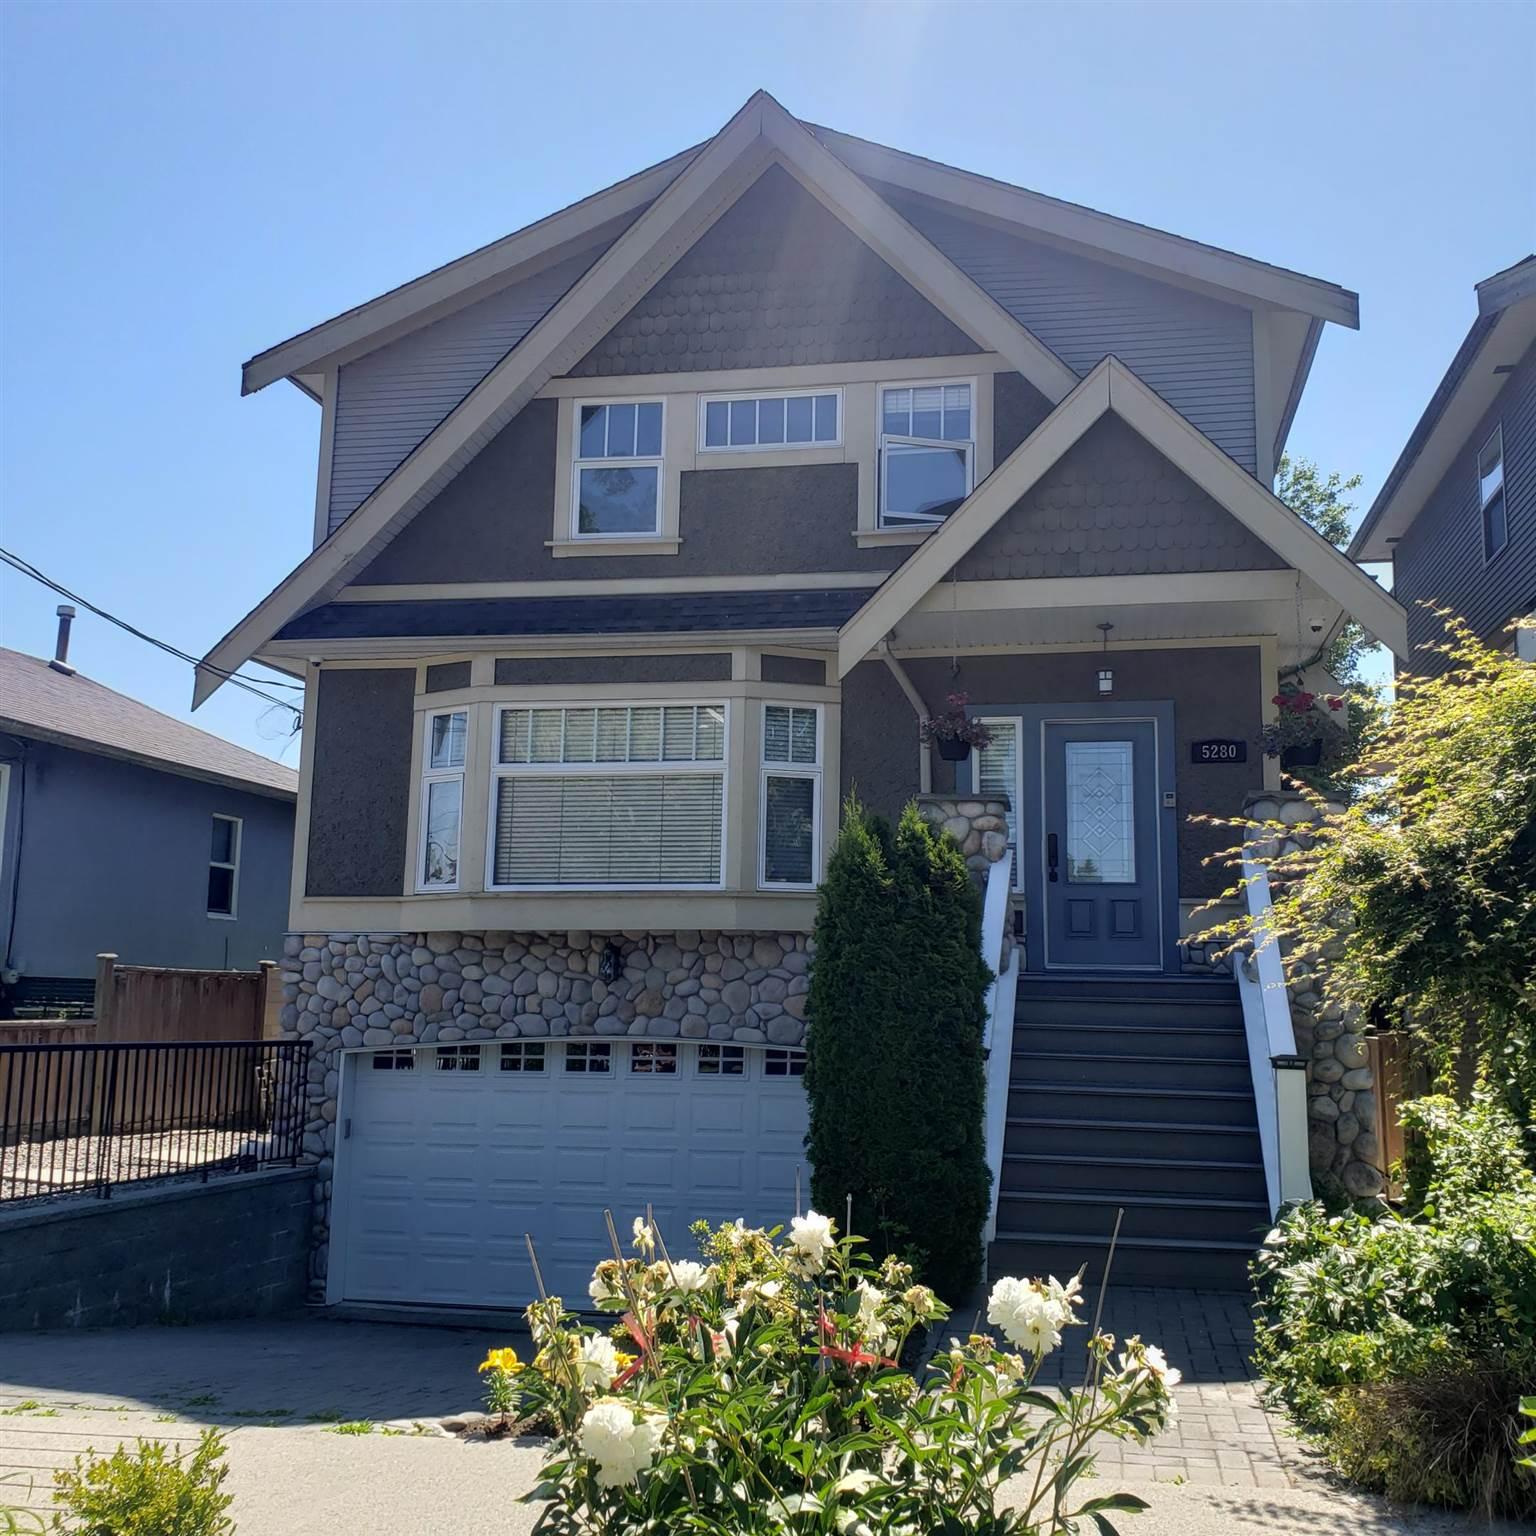 5280 MCKINNON STREET - Collingwood VE House/Single Family for sale, 5 Bedrooms (R2596561) - #1